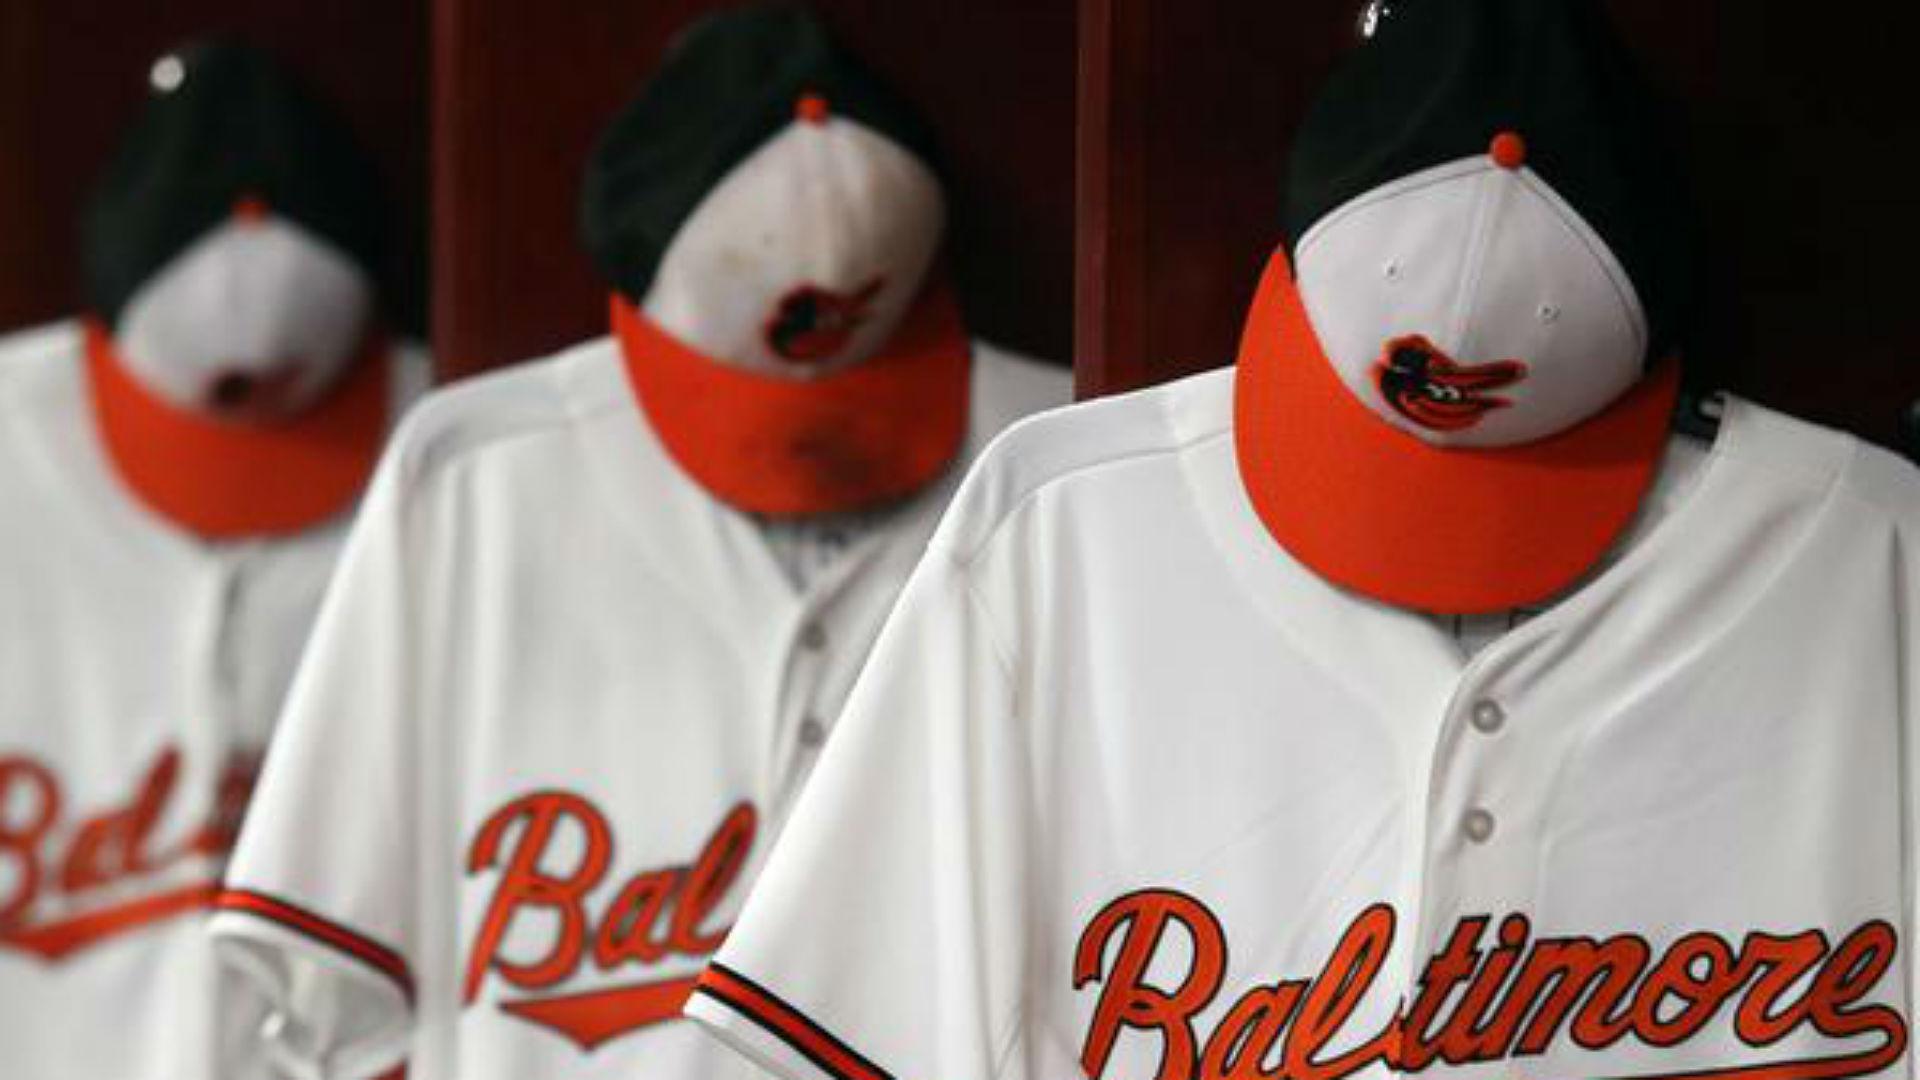 Baltimore-uniforms-051115-FTR-Twitter.jpg